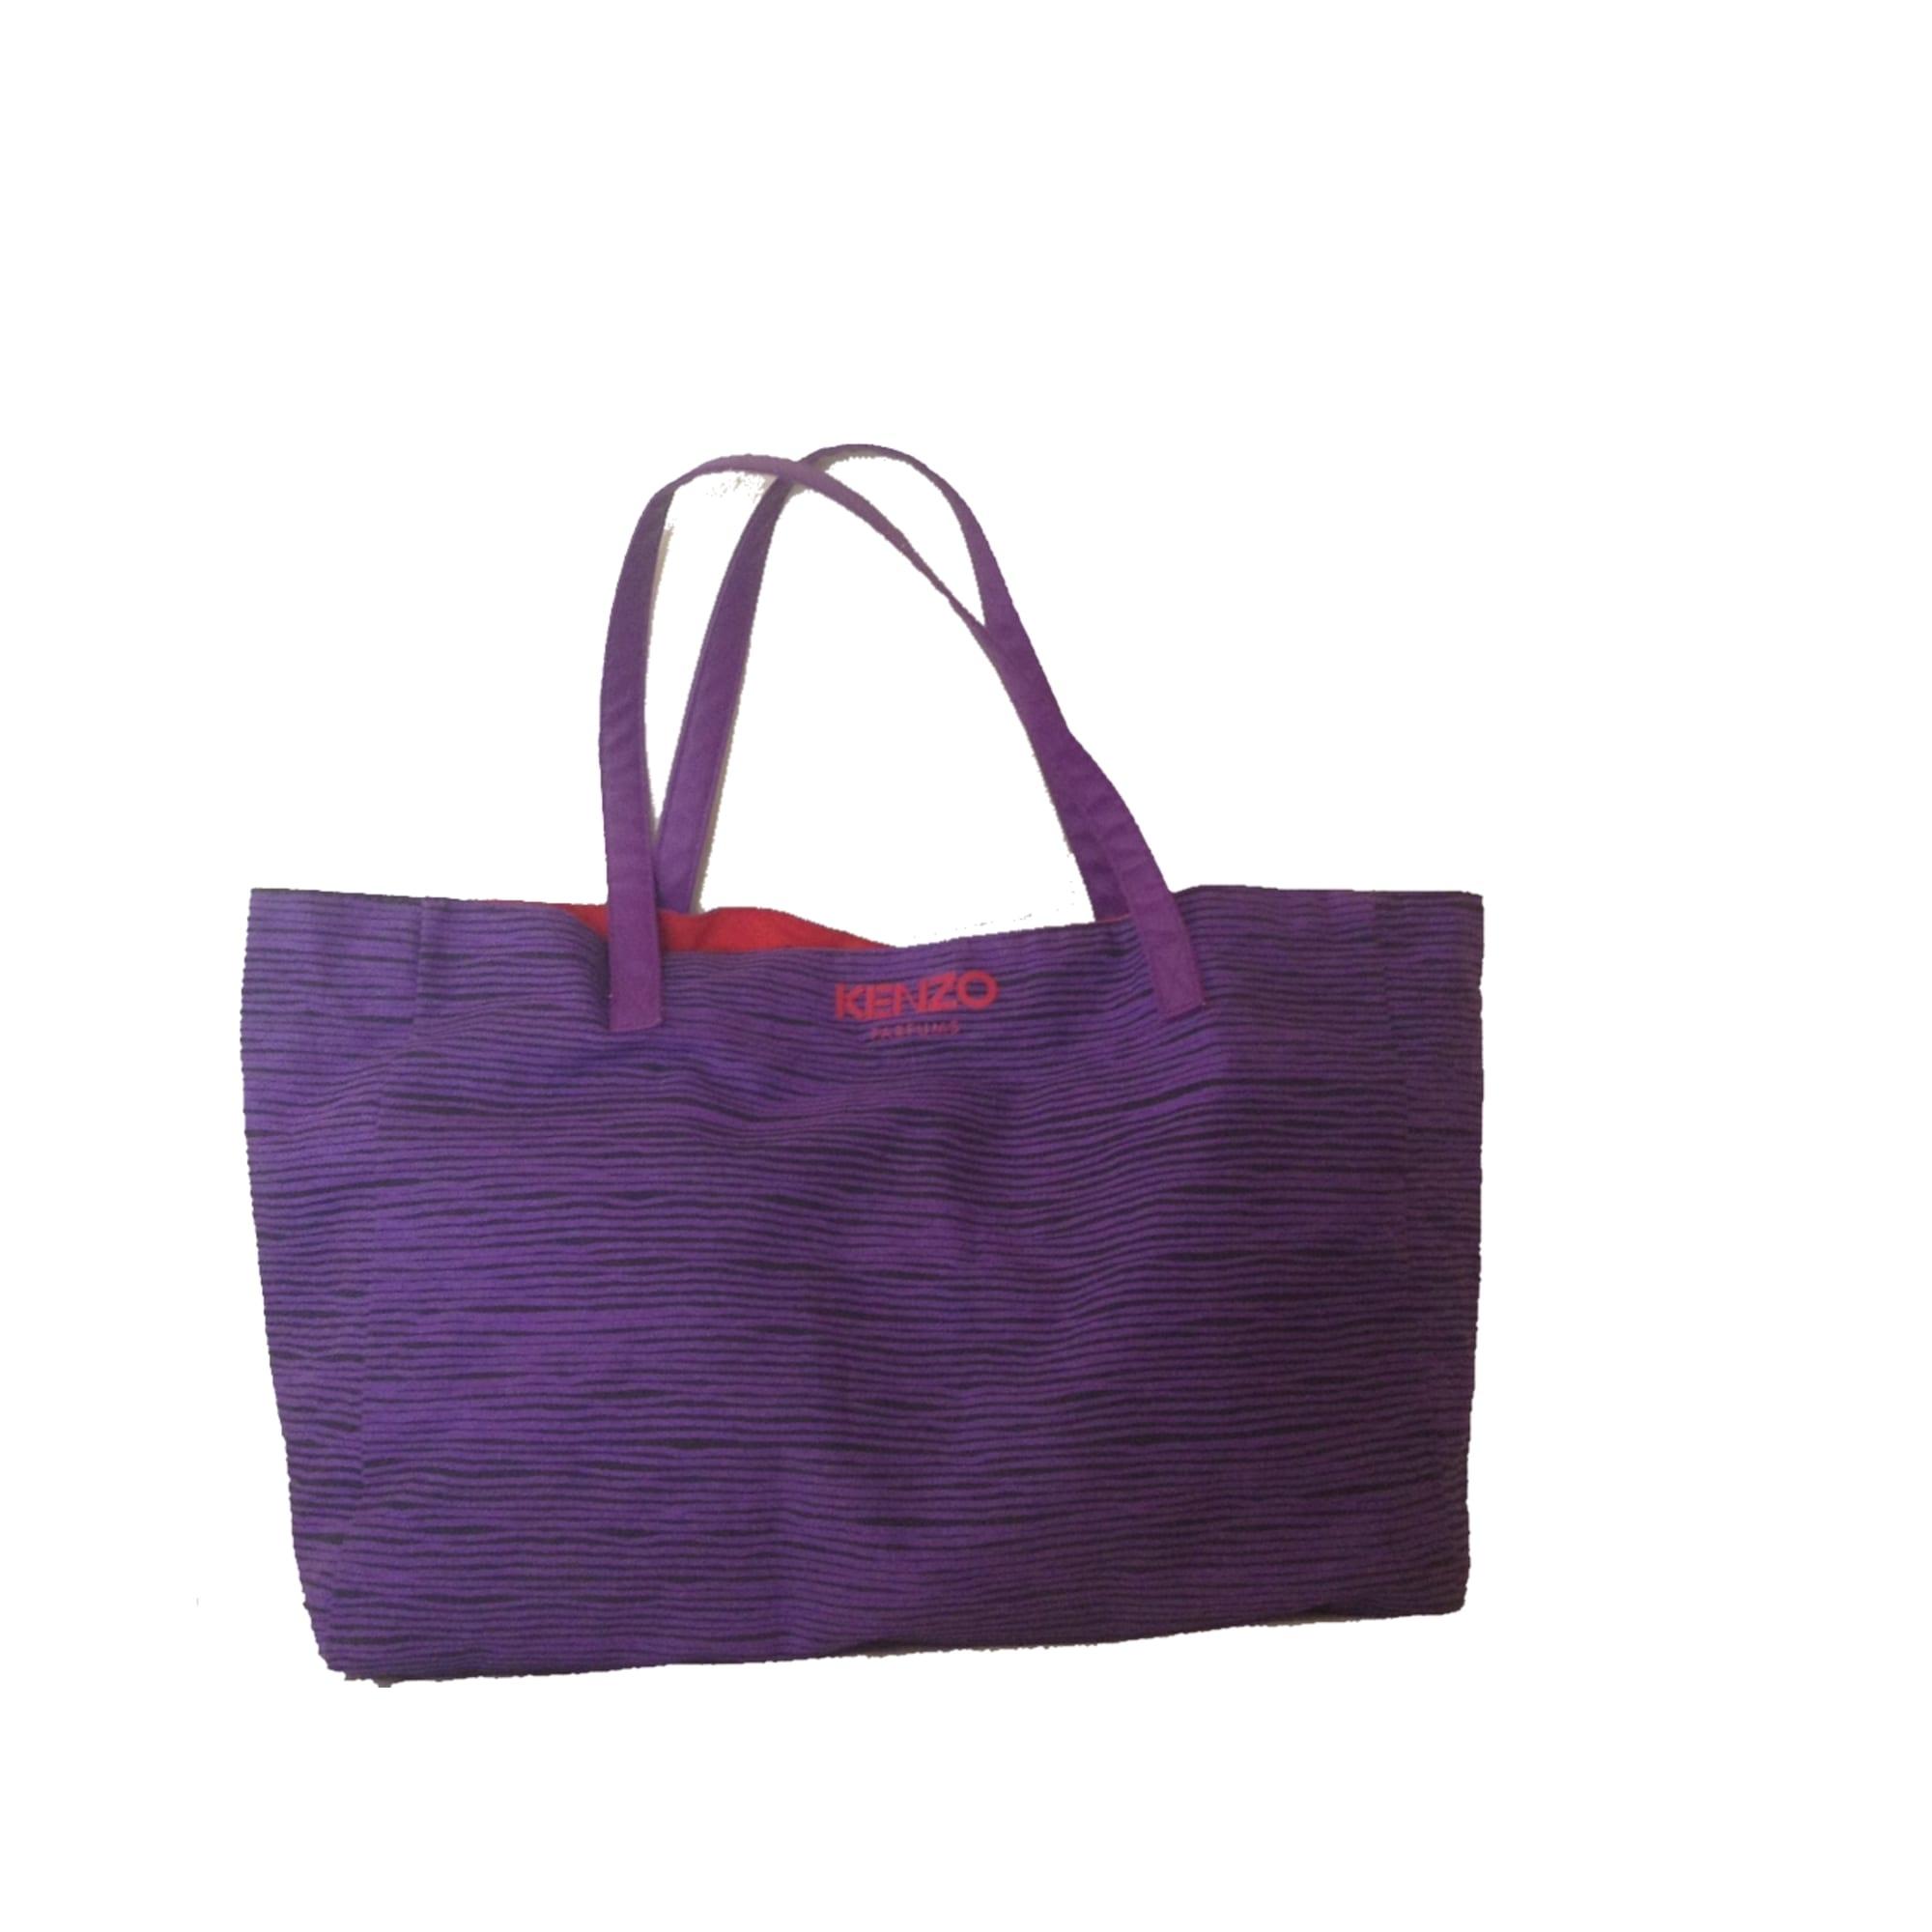 Sac XL en tissu KENZO Violet, mauve, lavande